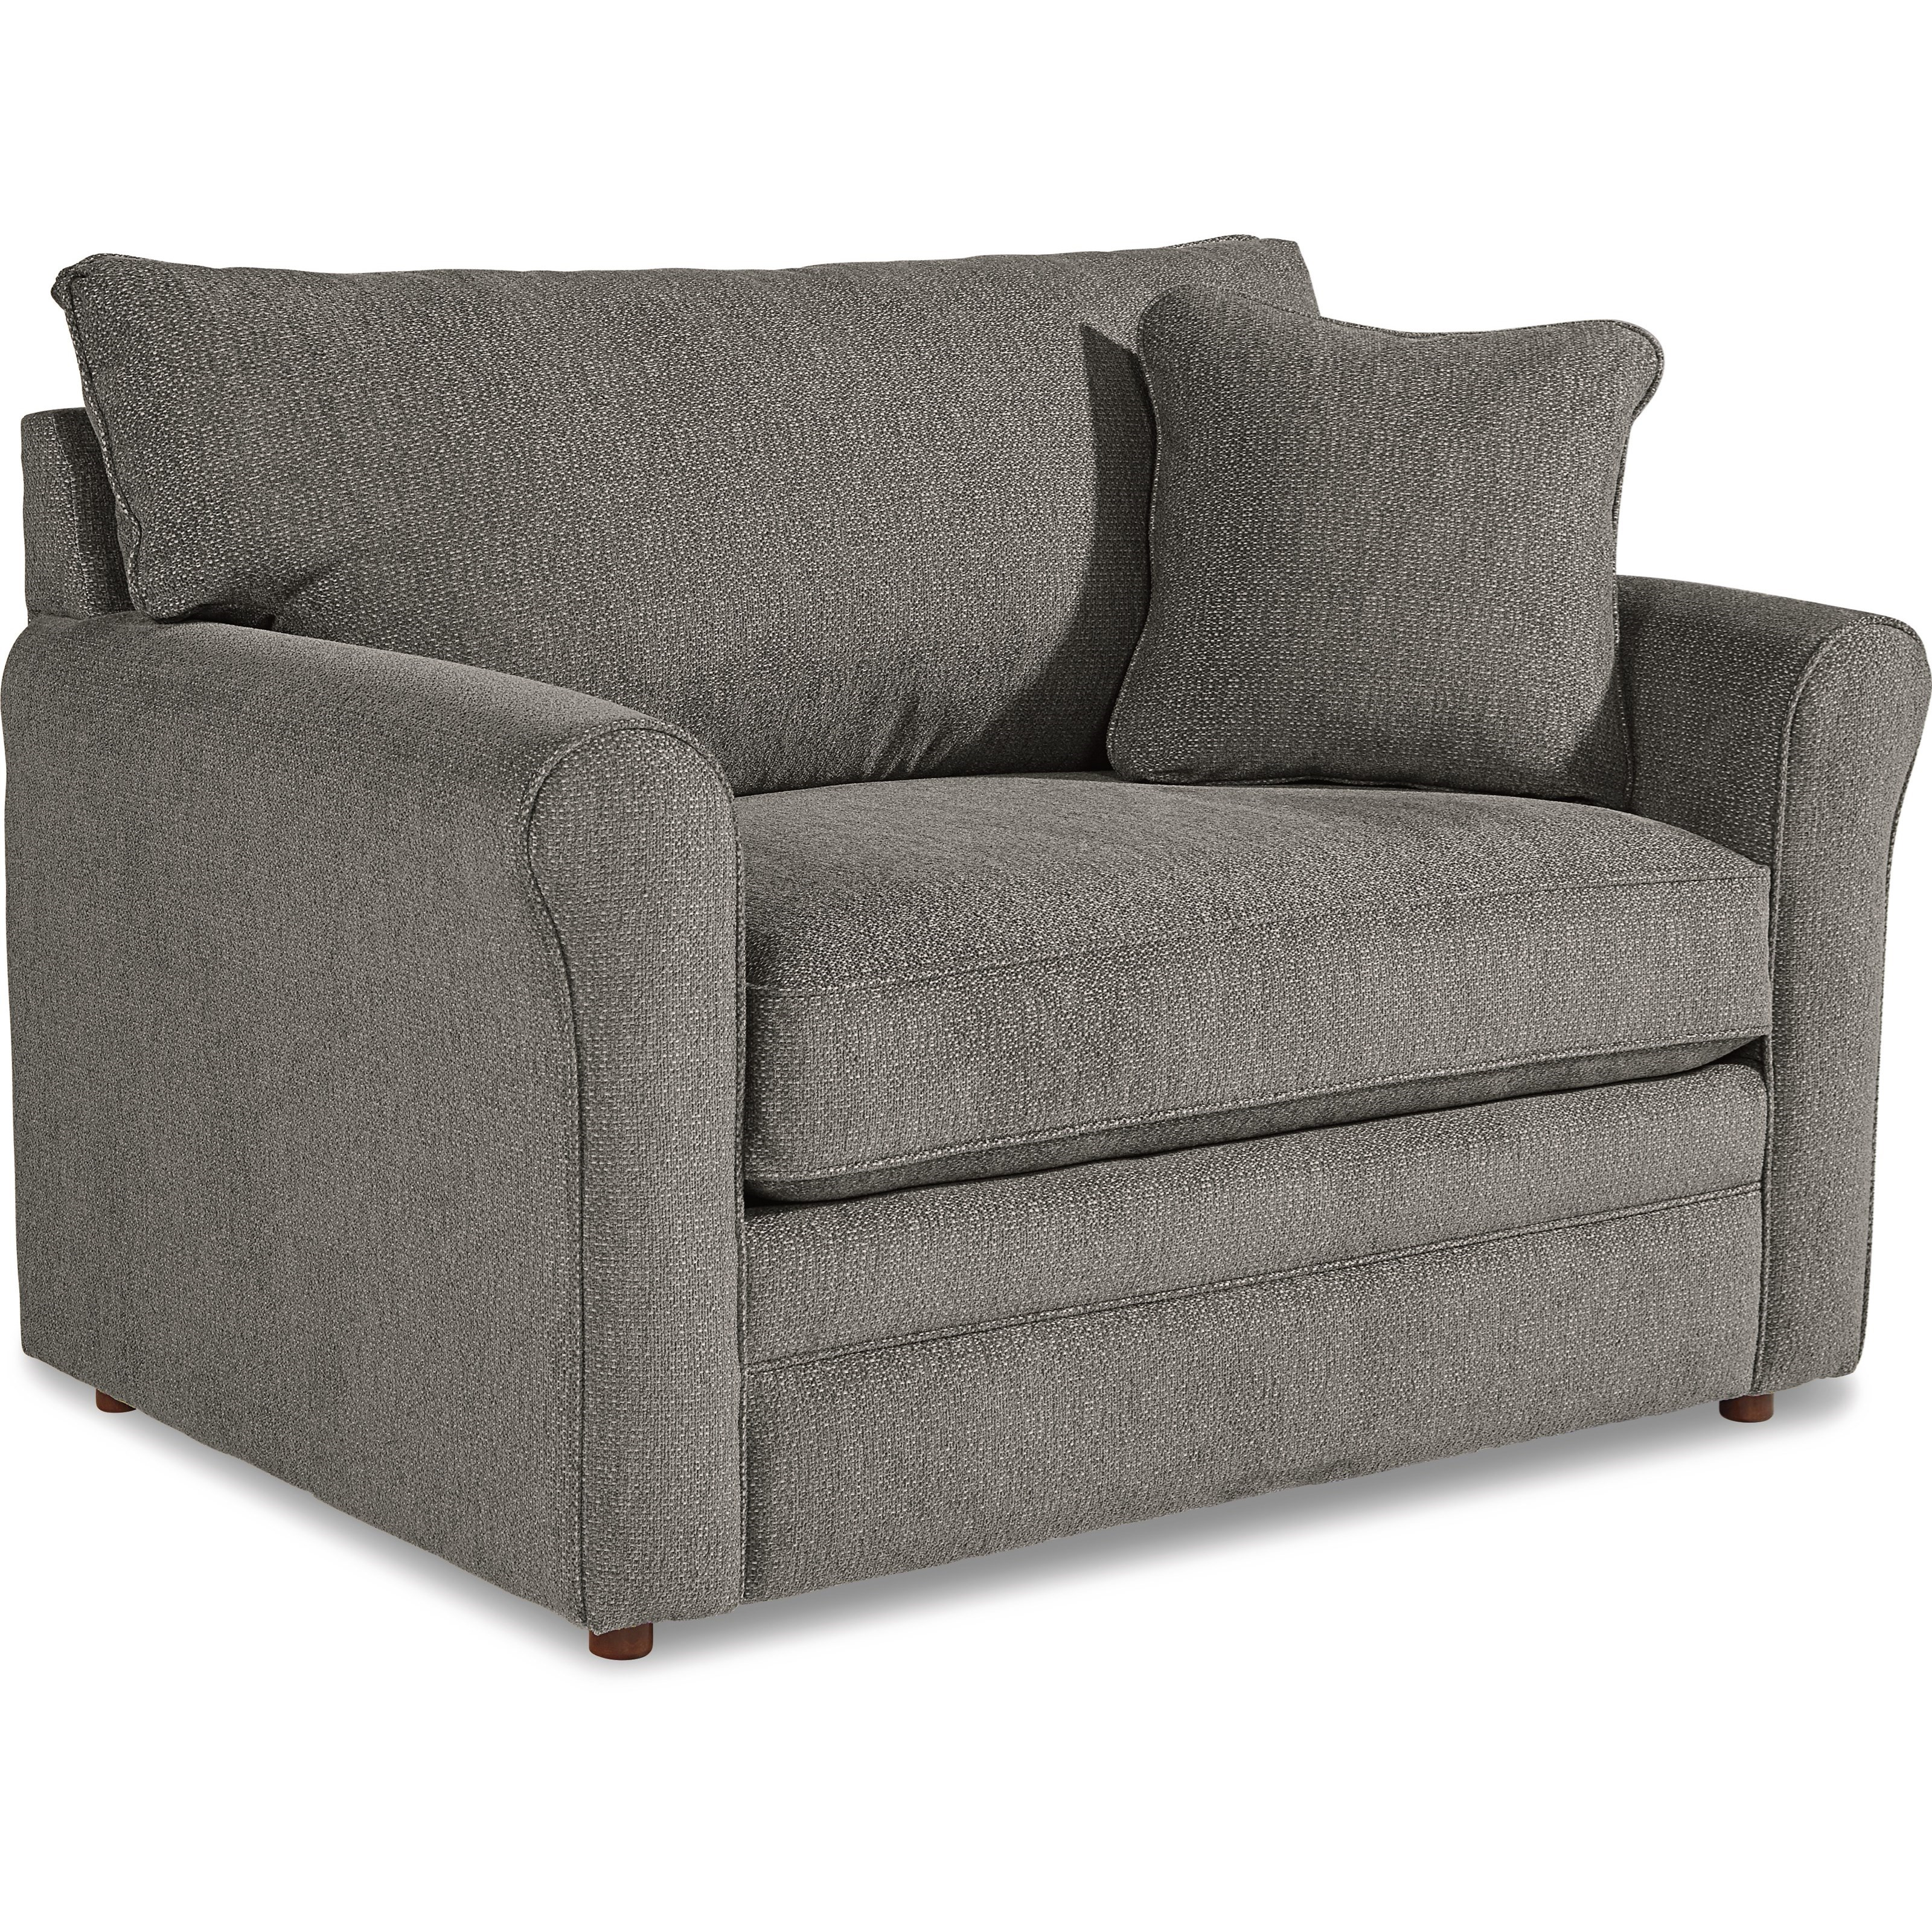 La Z Boy Leah Supreme Comfort Twin Sleeper Conlin S Furniture Sleeper Sofas